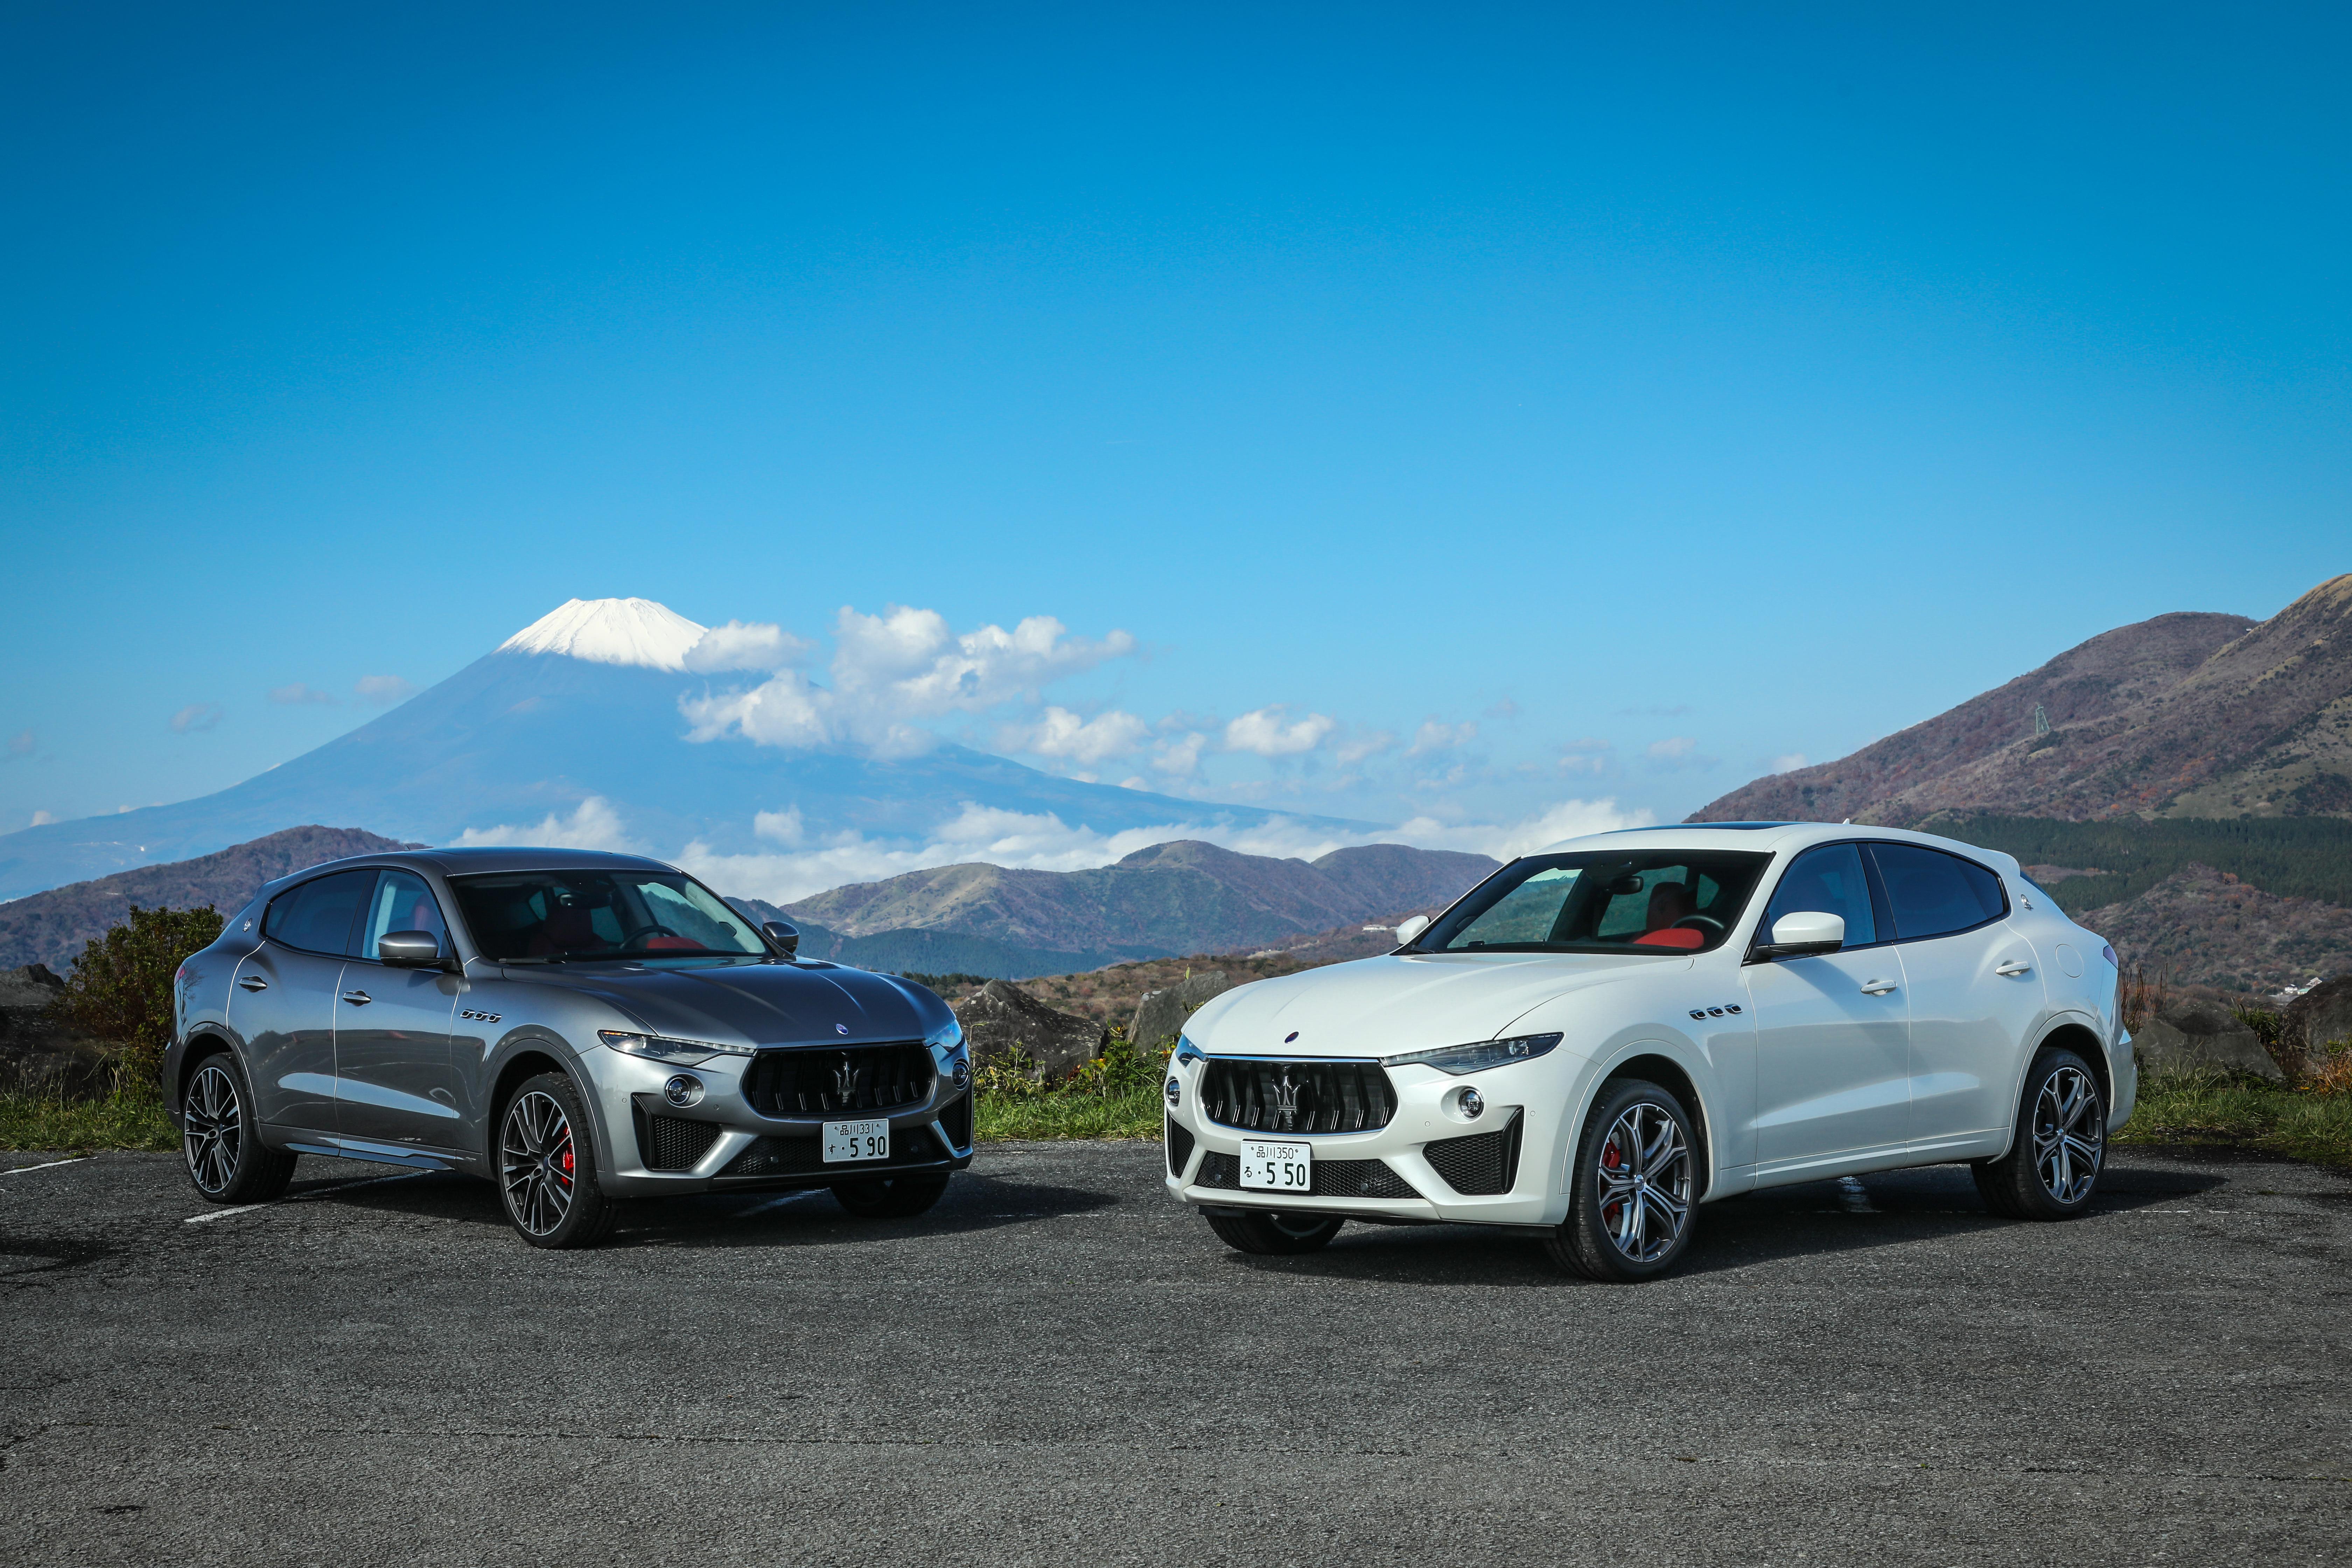 2018 Maserati Levante GTS and Trofeo Review